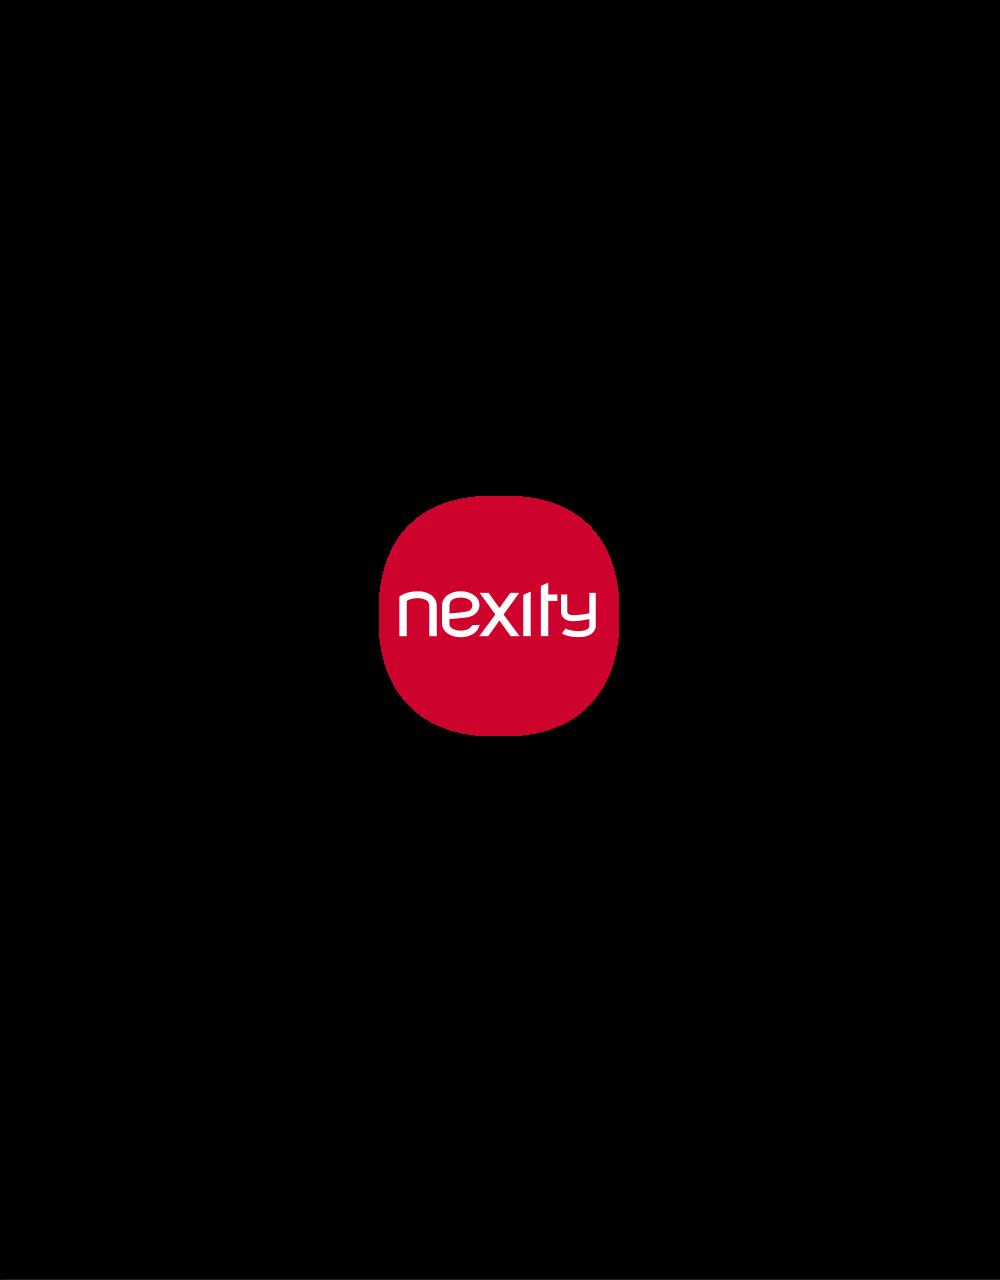 1000x1280_nexity_s_3